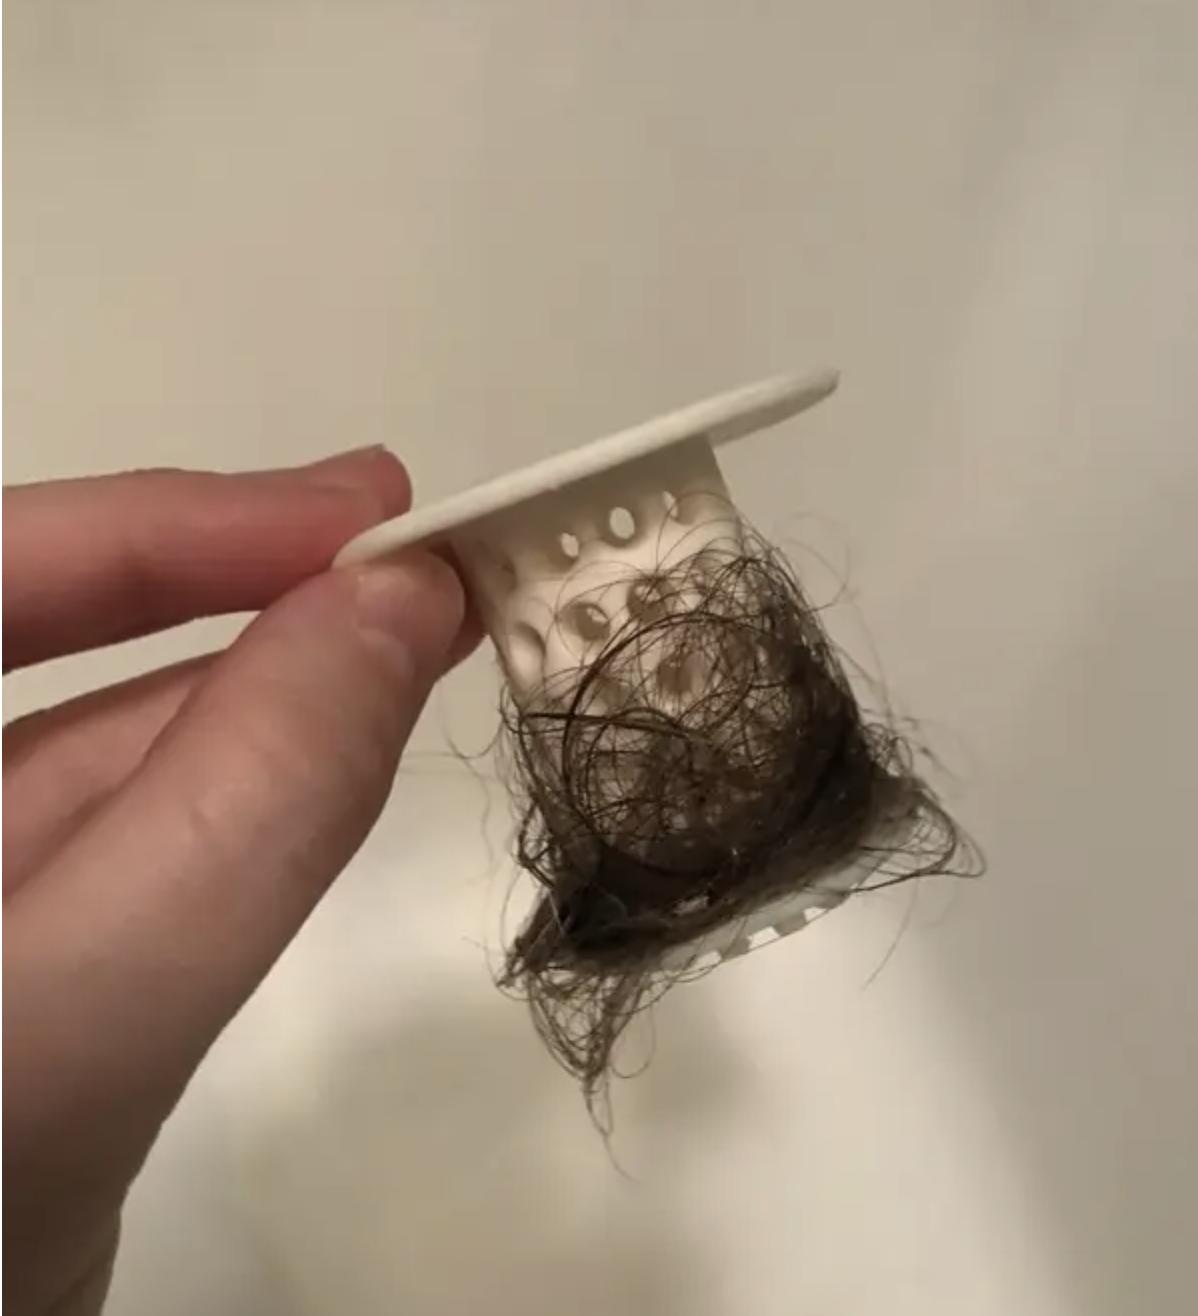 the tubshroom full of hair